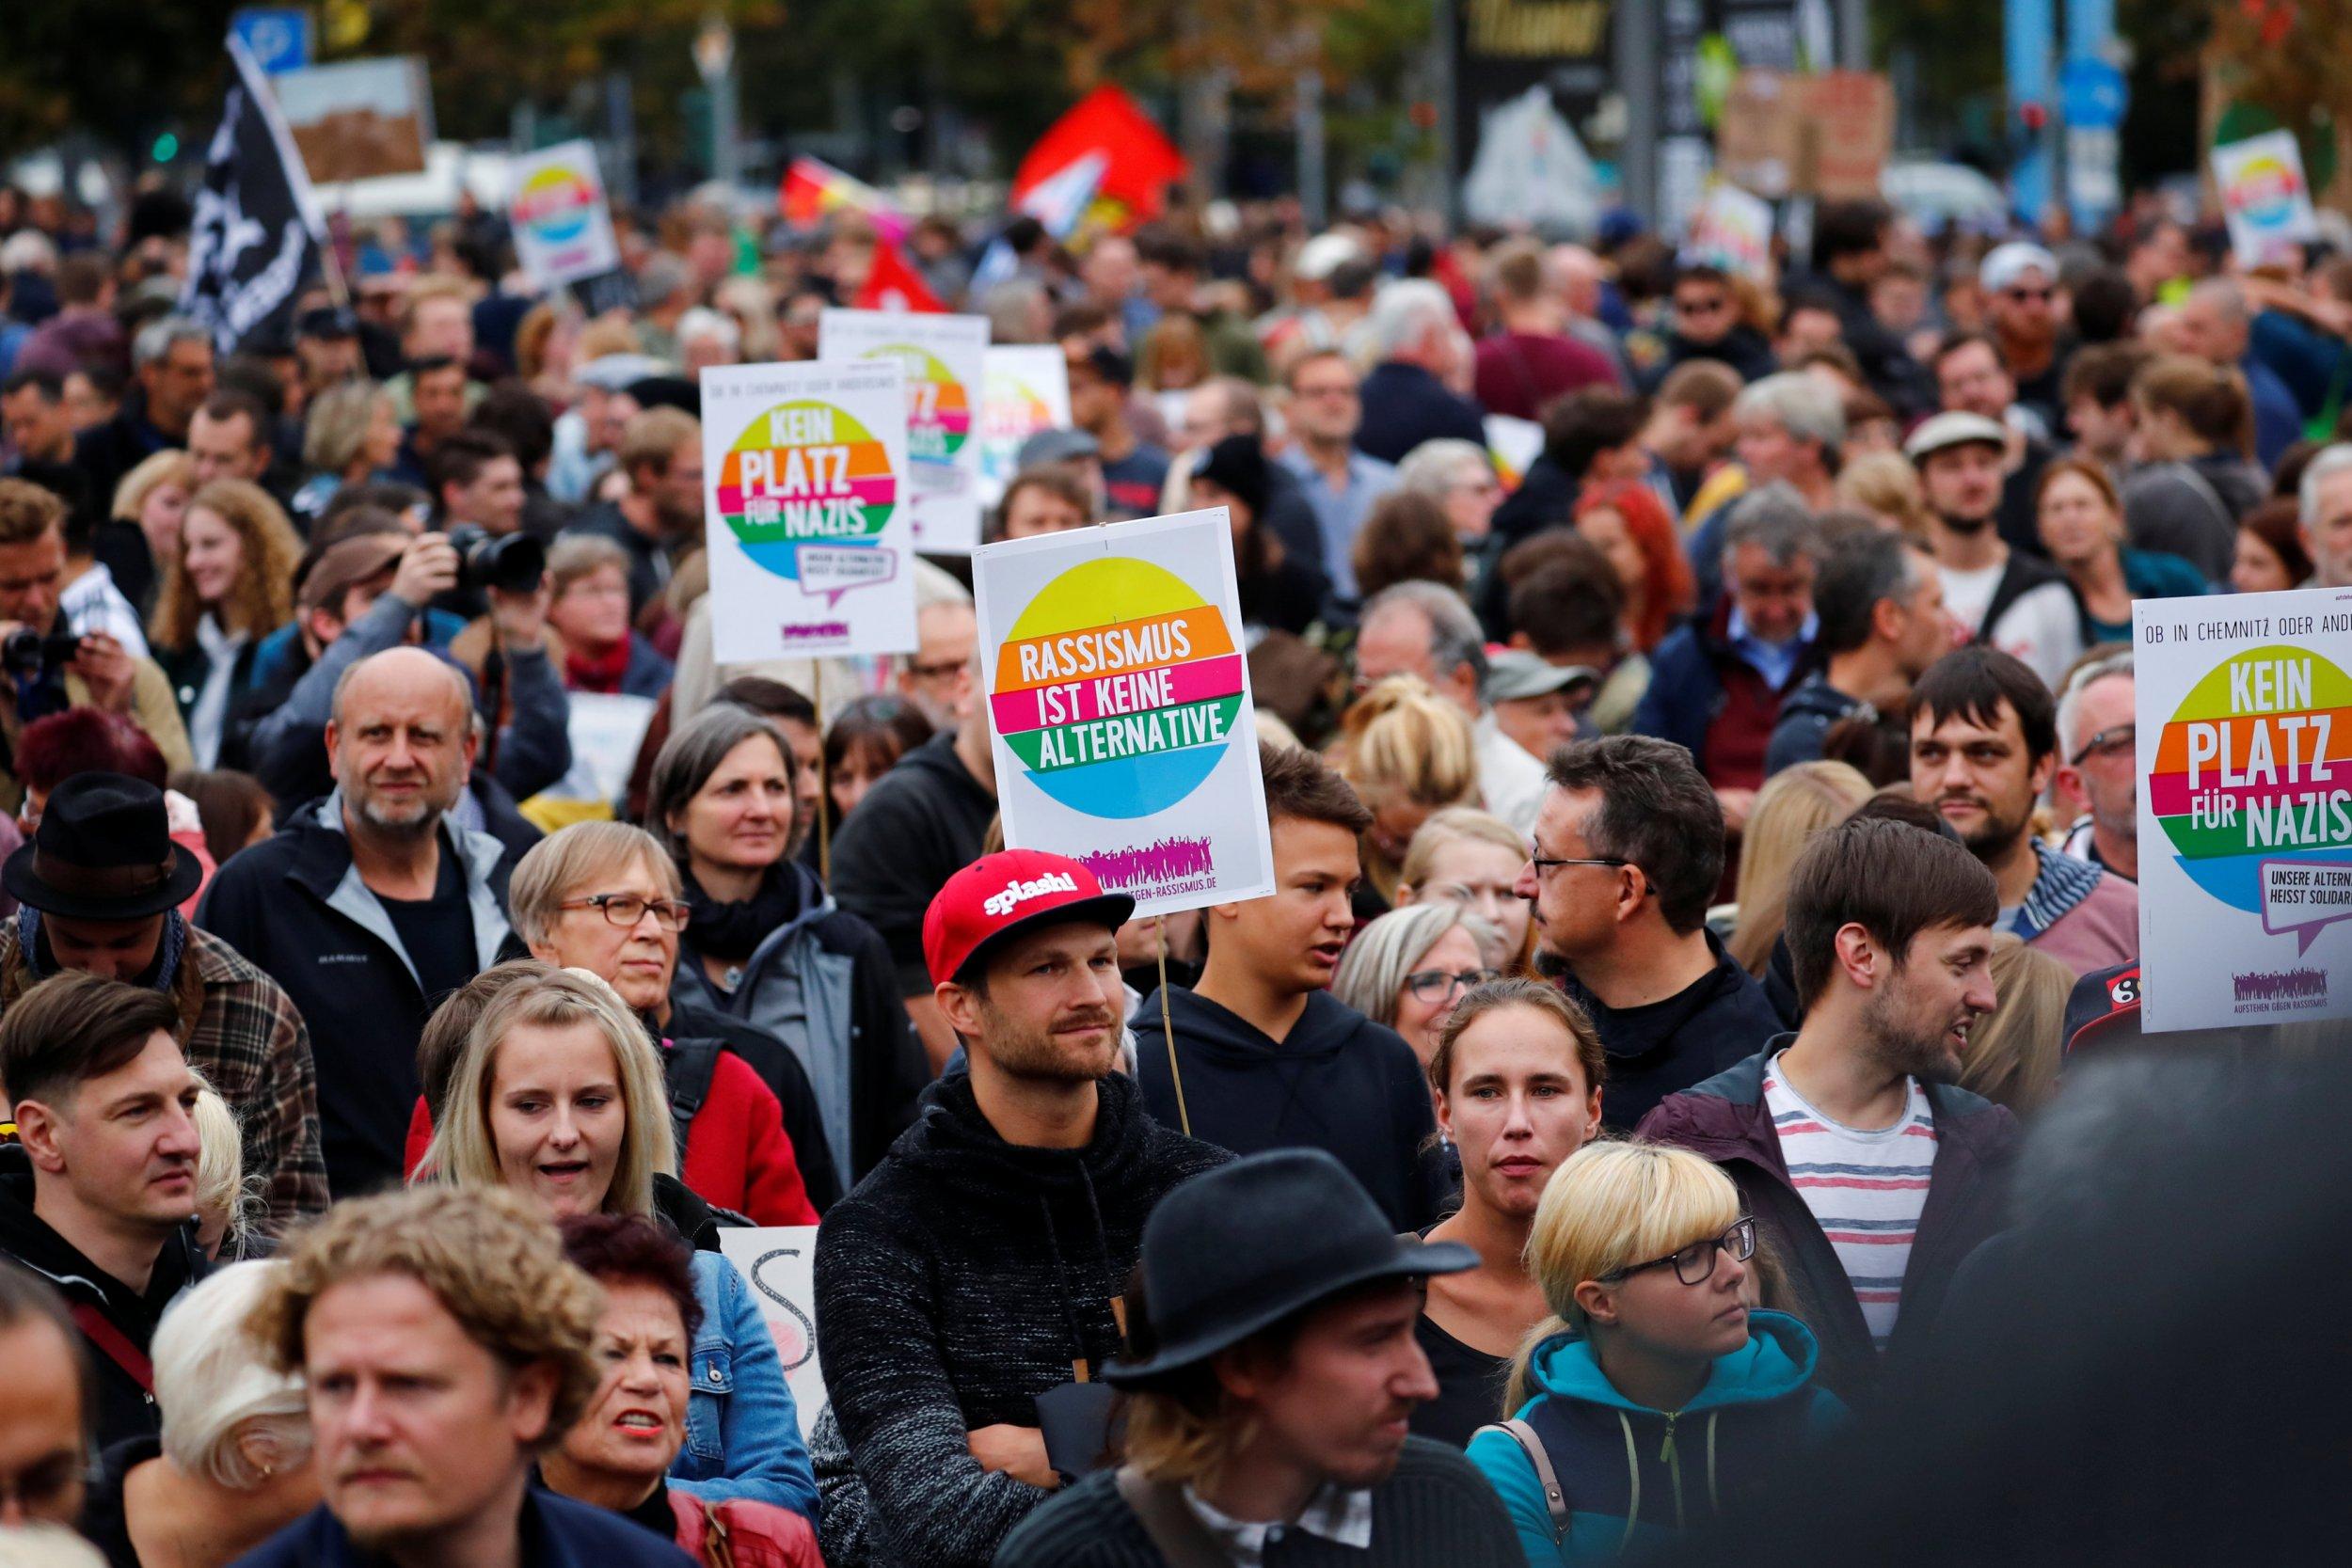 2018-09-01T192200Z_2_LYNXNPEE802F8_RTROPTP_4_GERMANY-PROTESTS